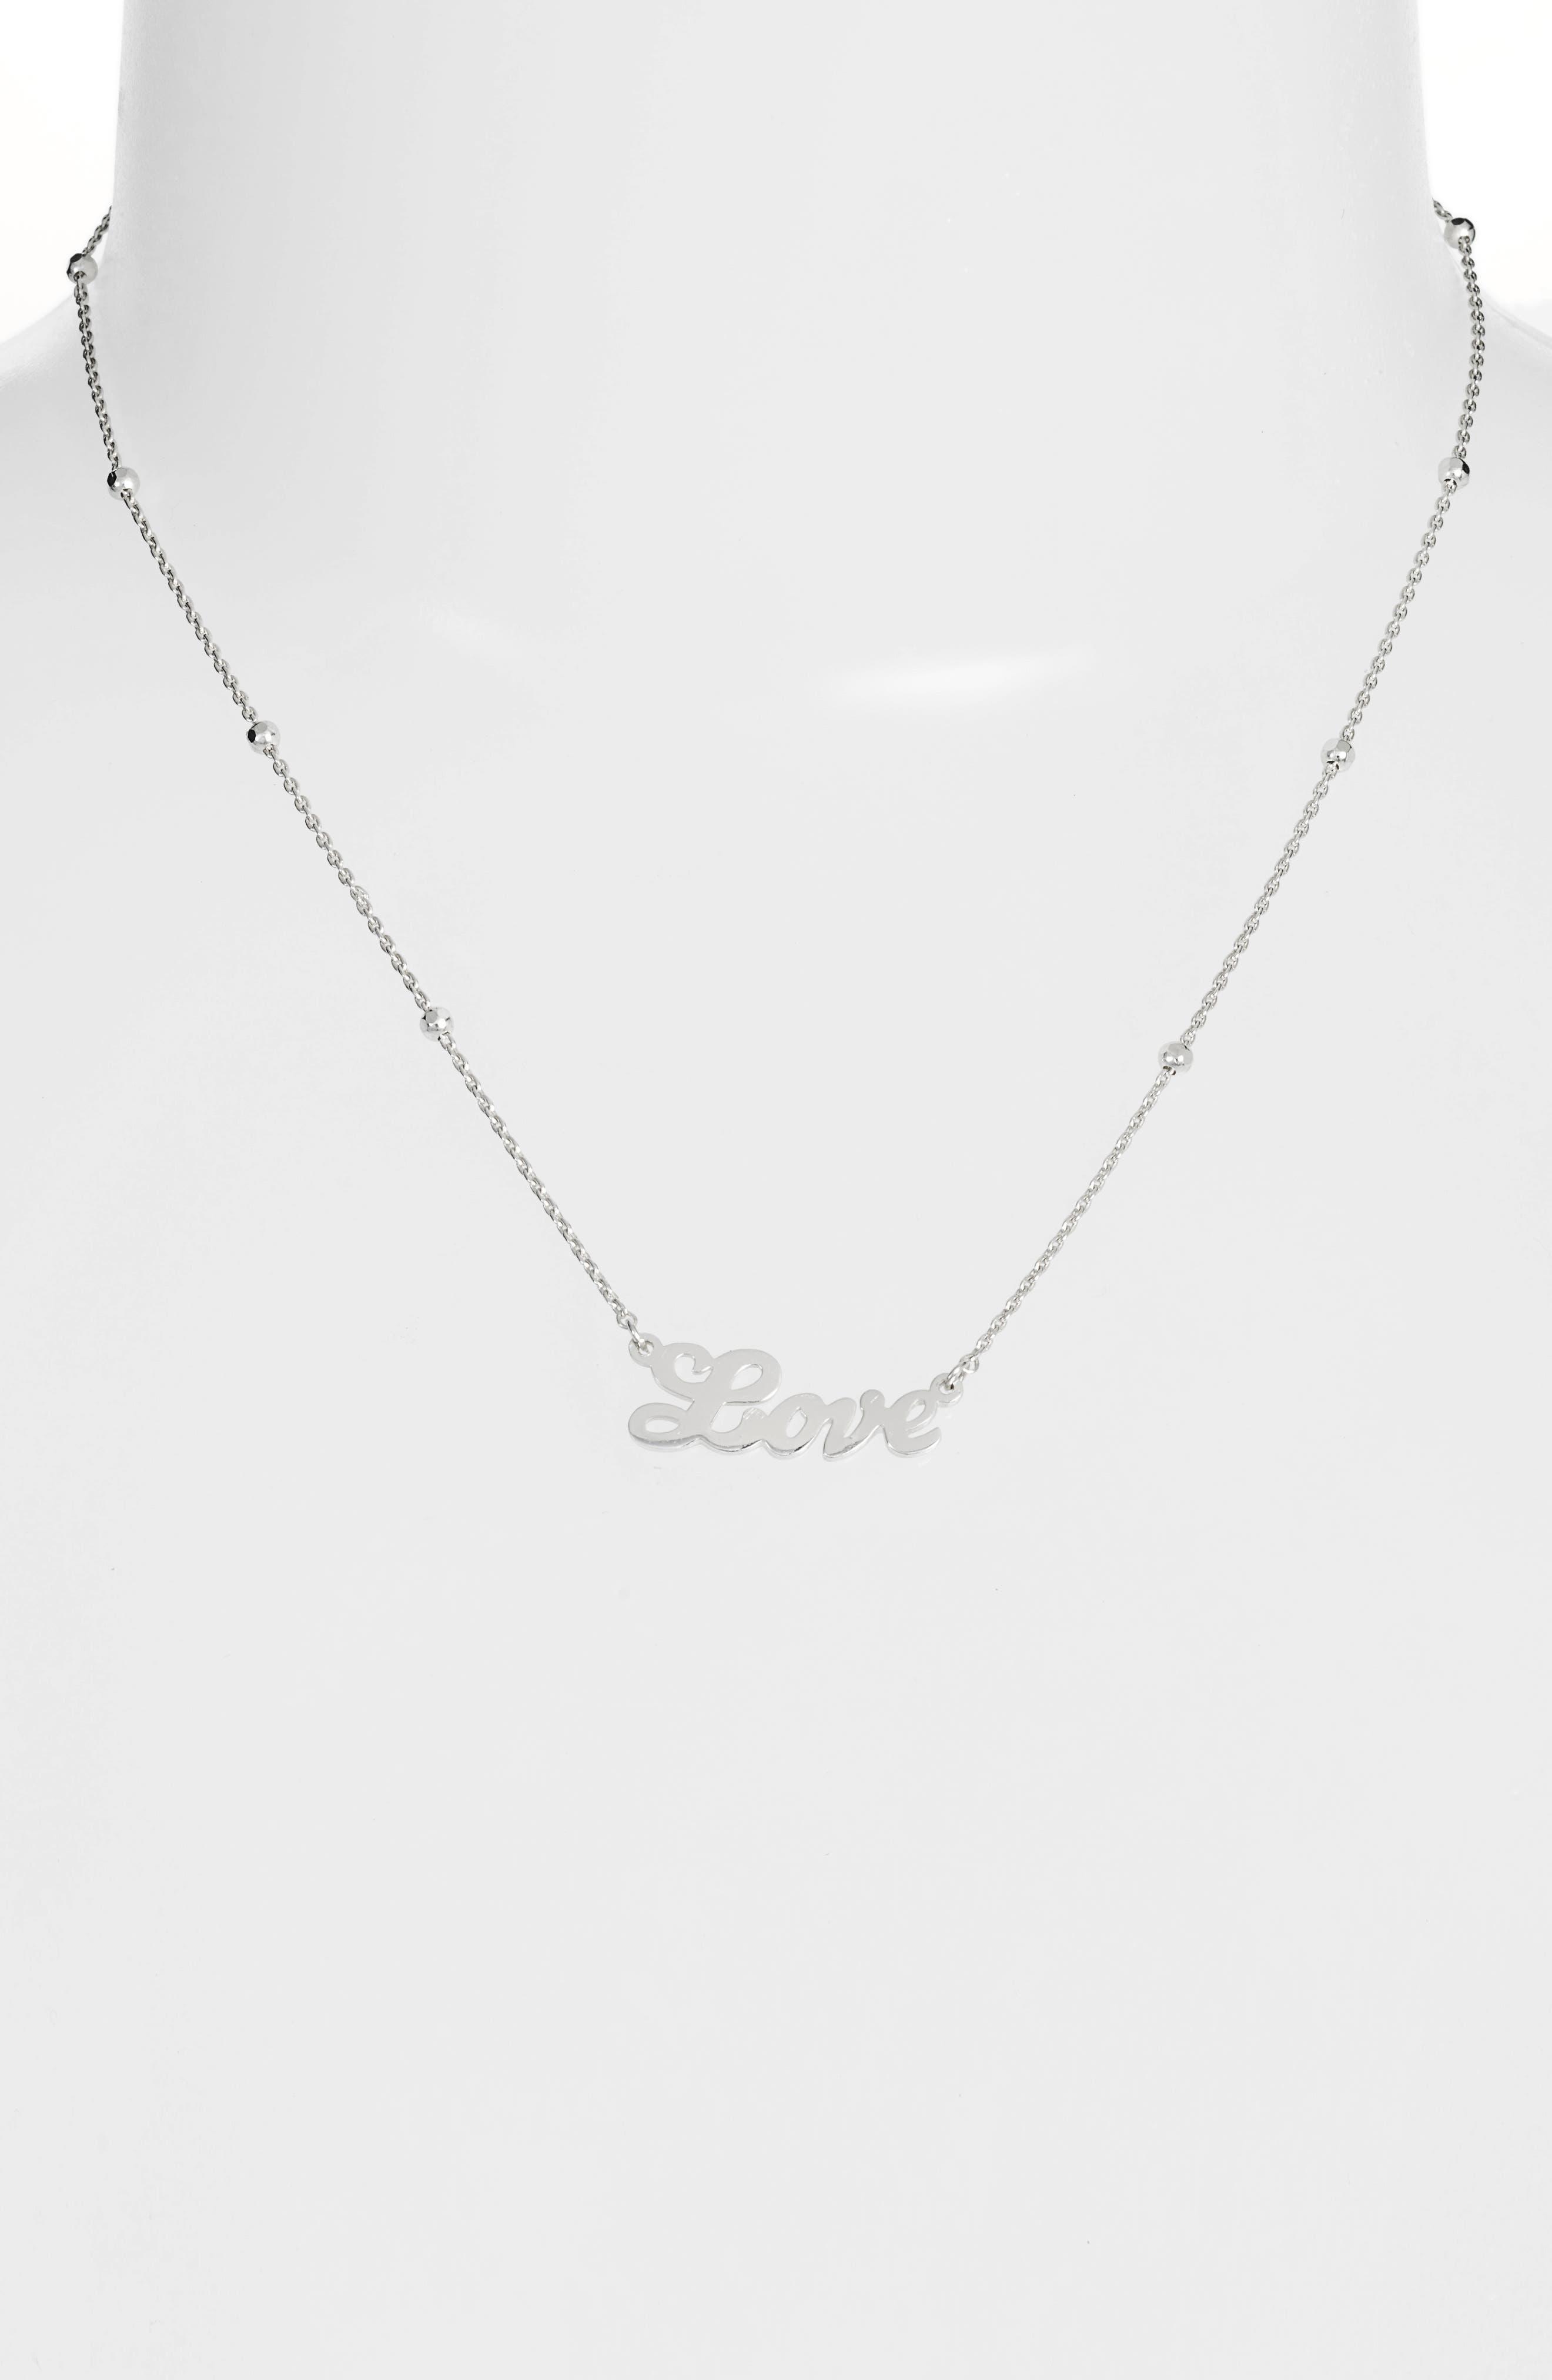 Love Pendant Necklace,                             Alternate thumbnail 2, color,                             Silver